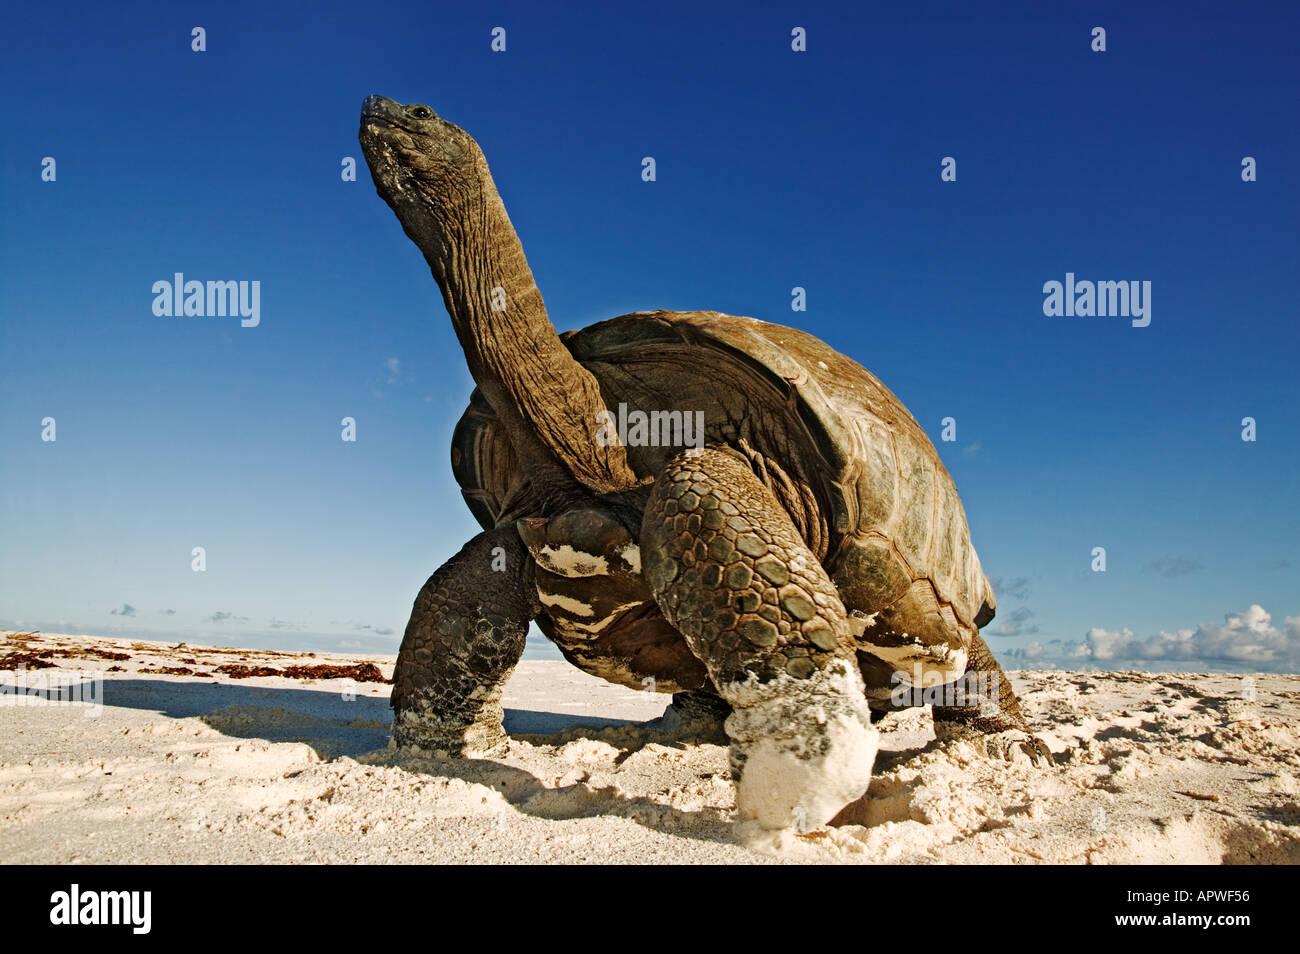 Giant tortoise Geochelone gigantea Vulnerable species On the beach Seychelles Cousine Island Dist Seychelles islands - Stock Image